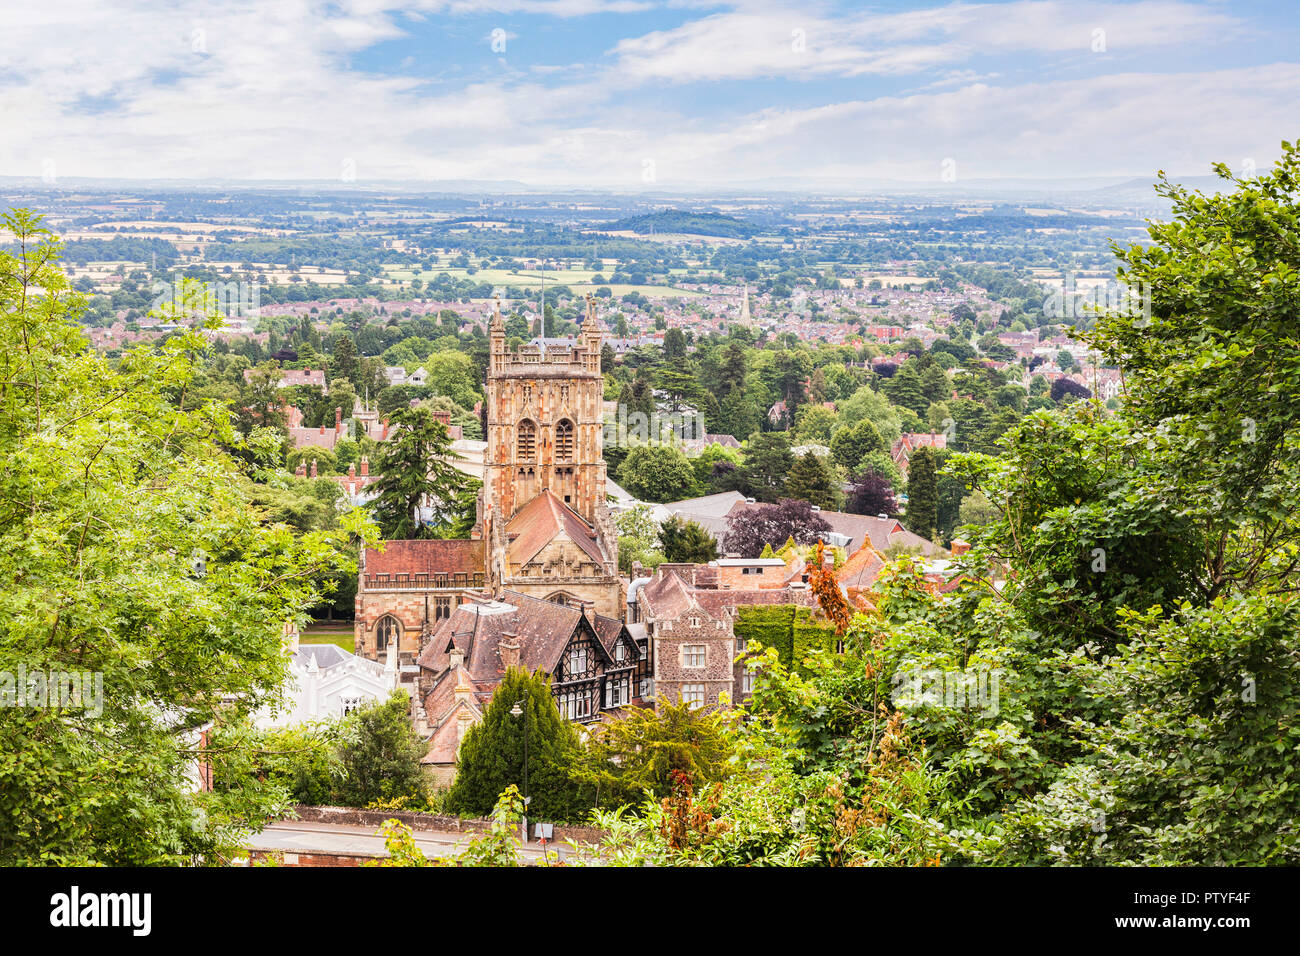 Great Malvern Priory, Great Malvern, Worcestershire, England - Stock Image